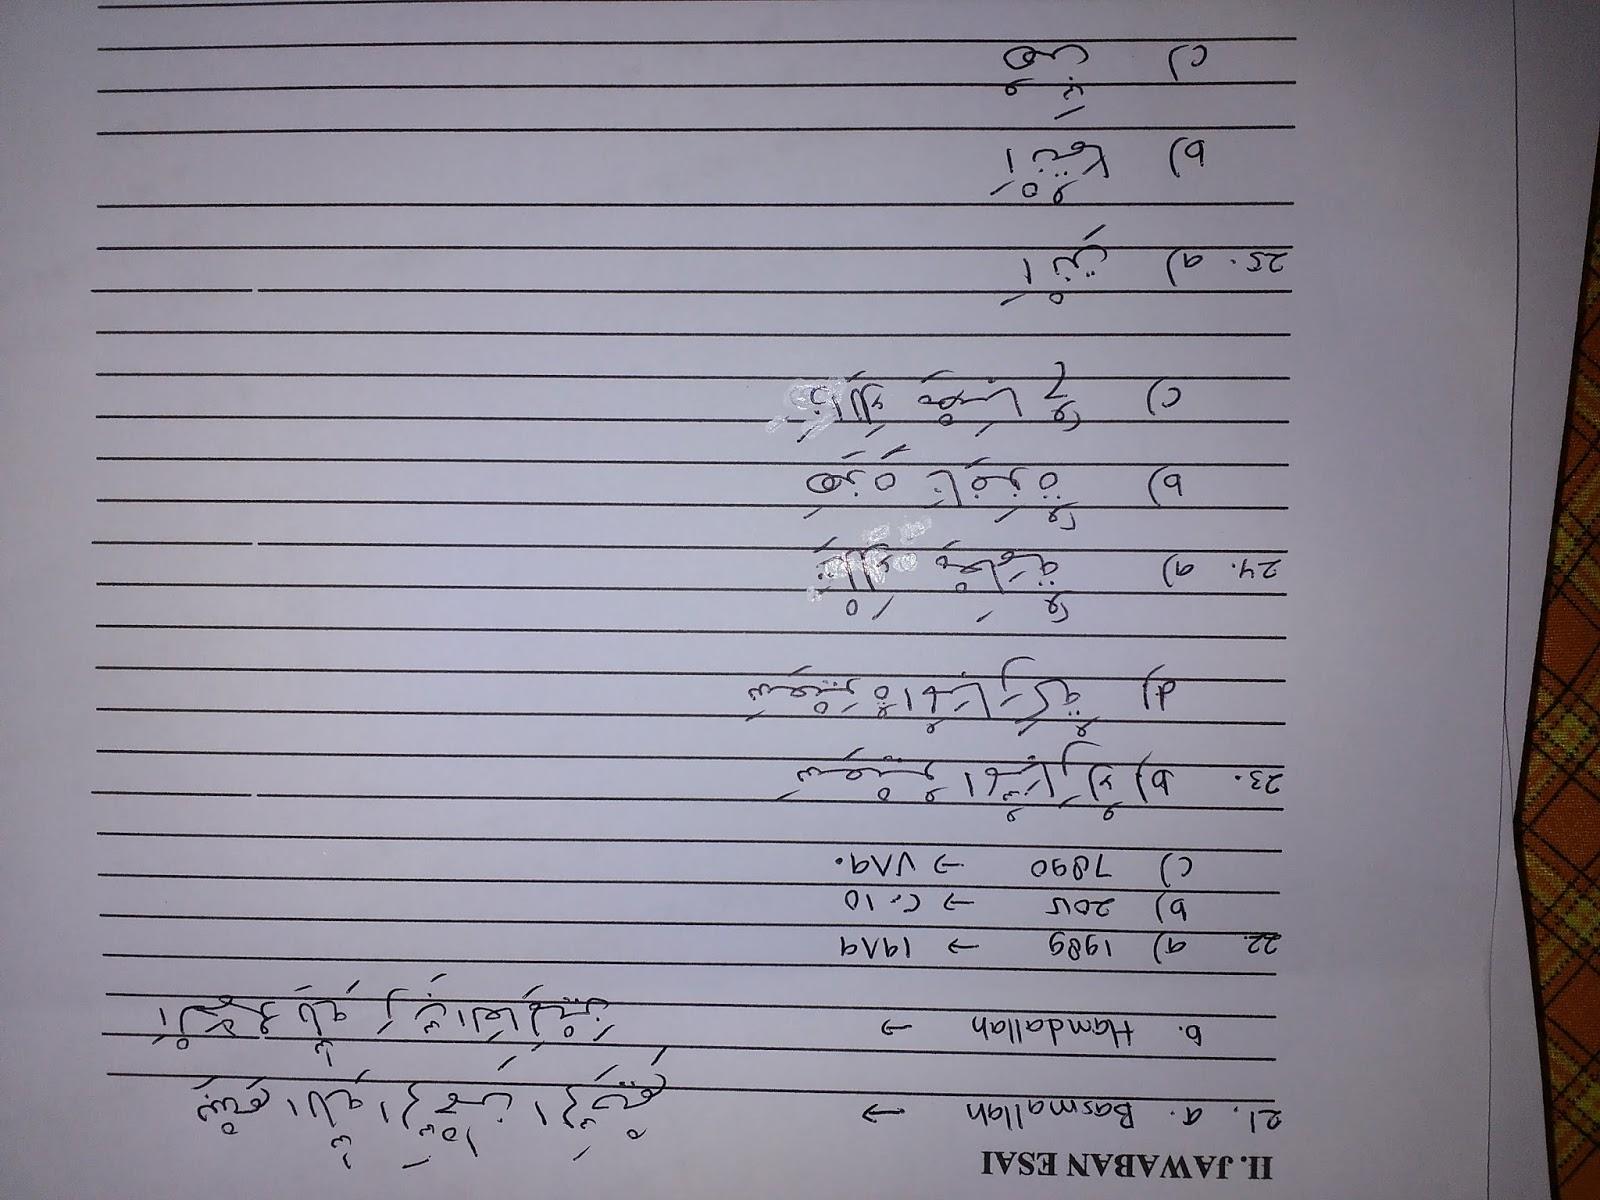 Contoh Soal Bahasa Arab Sd Kelas 1